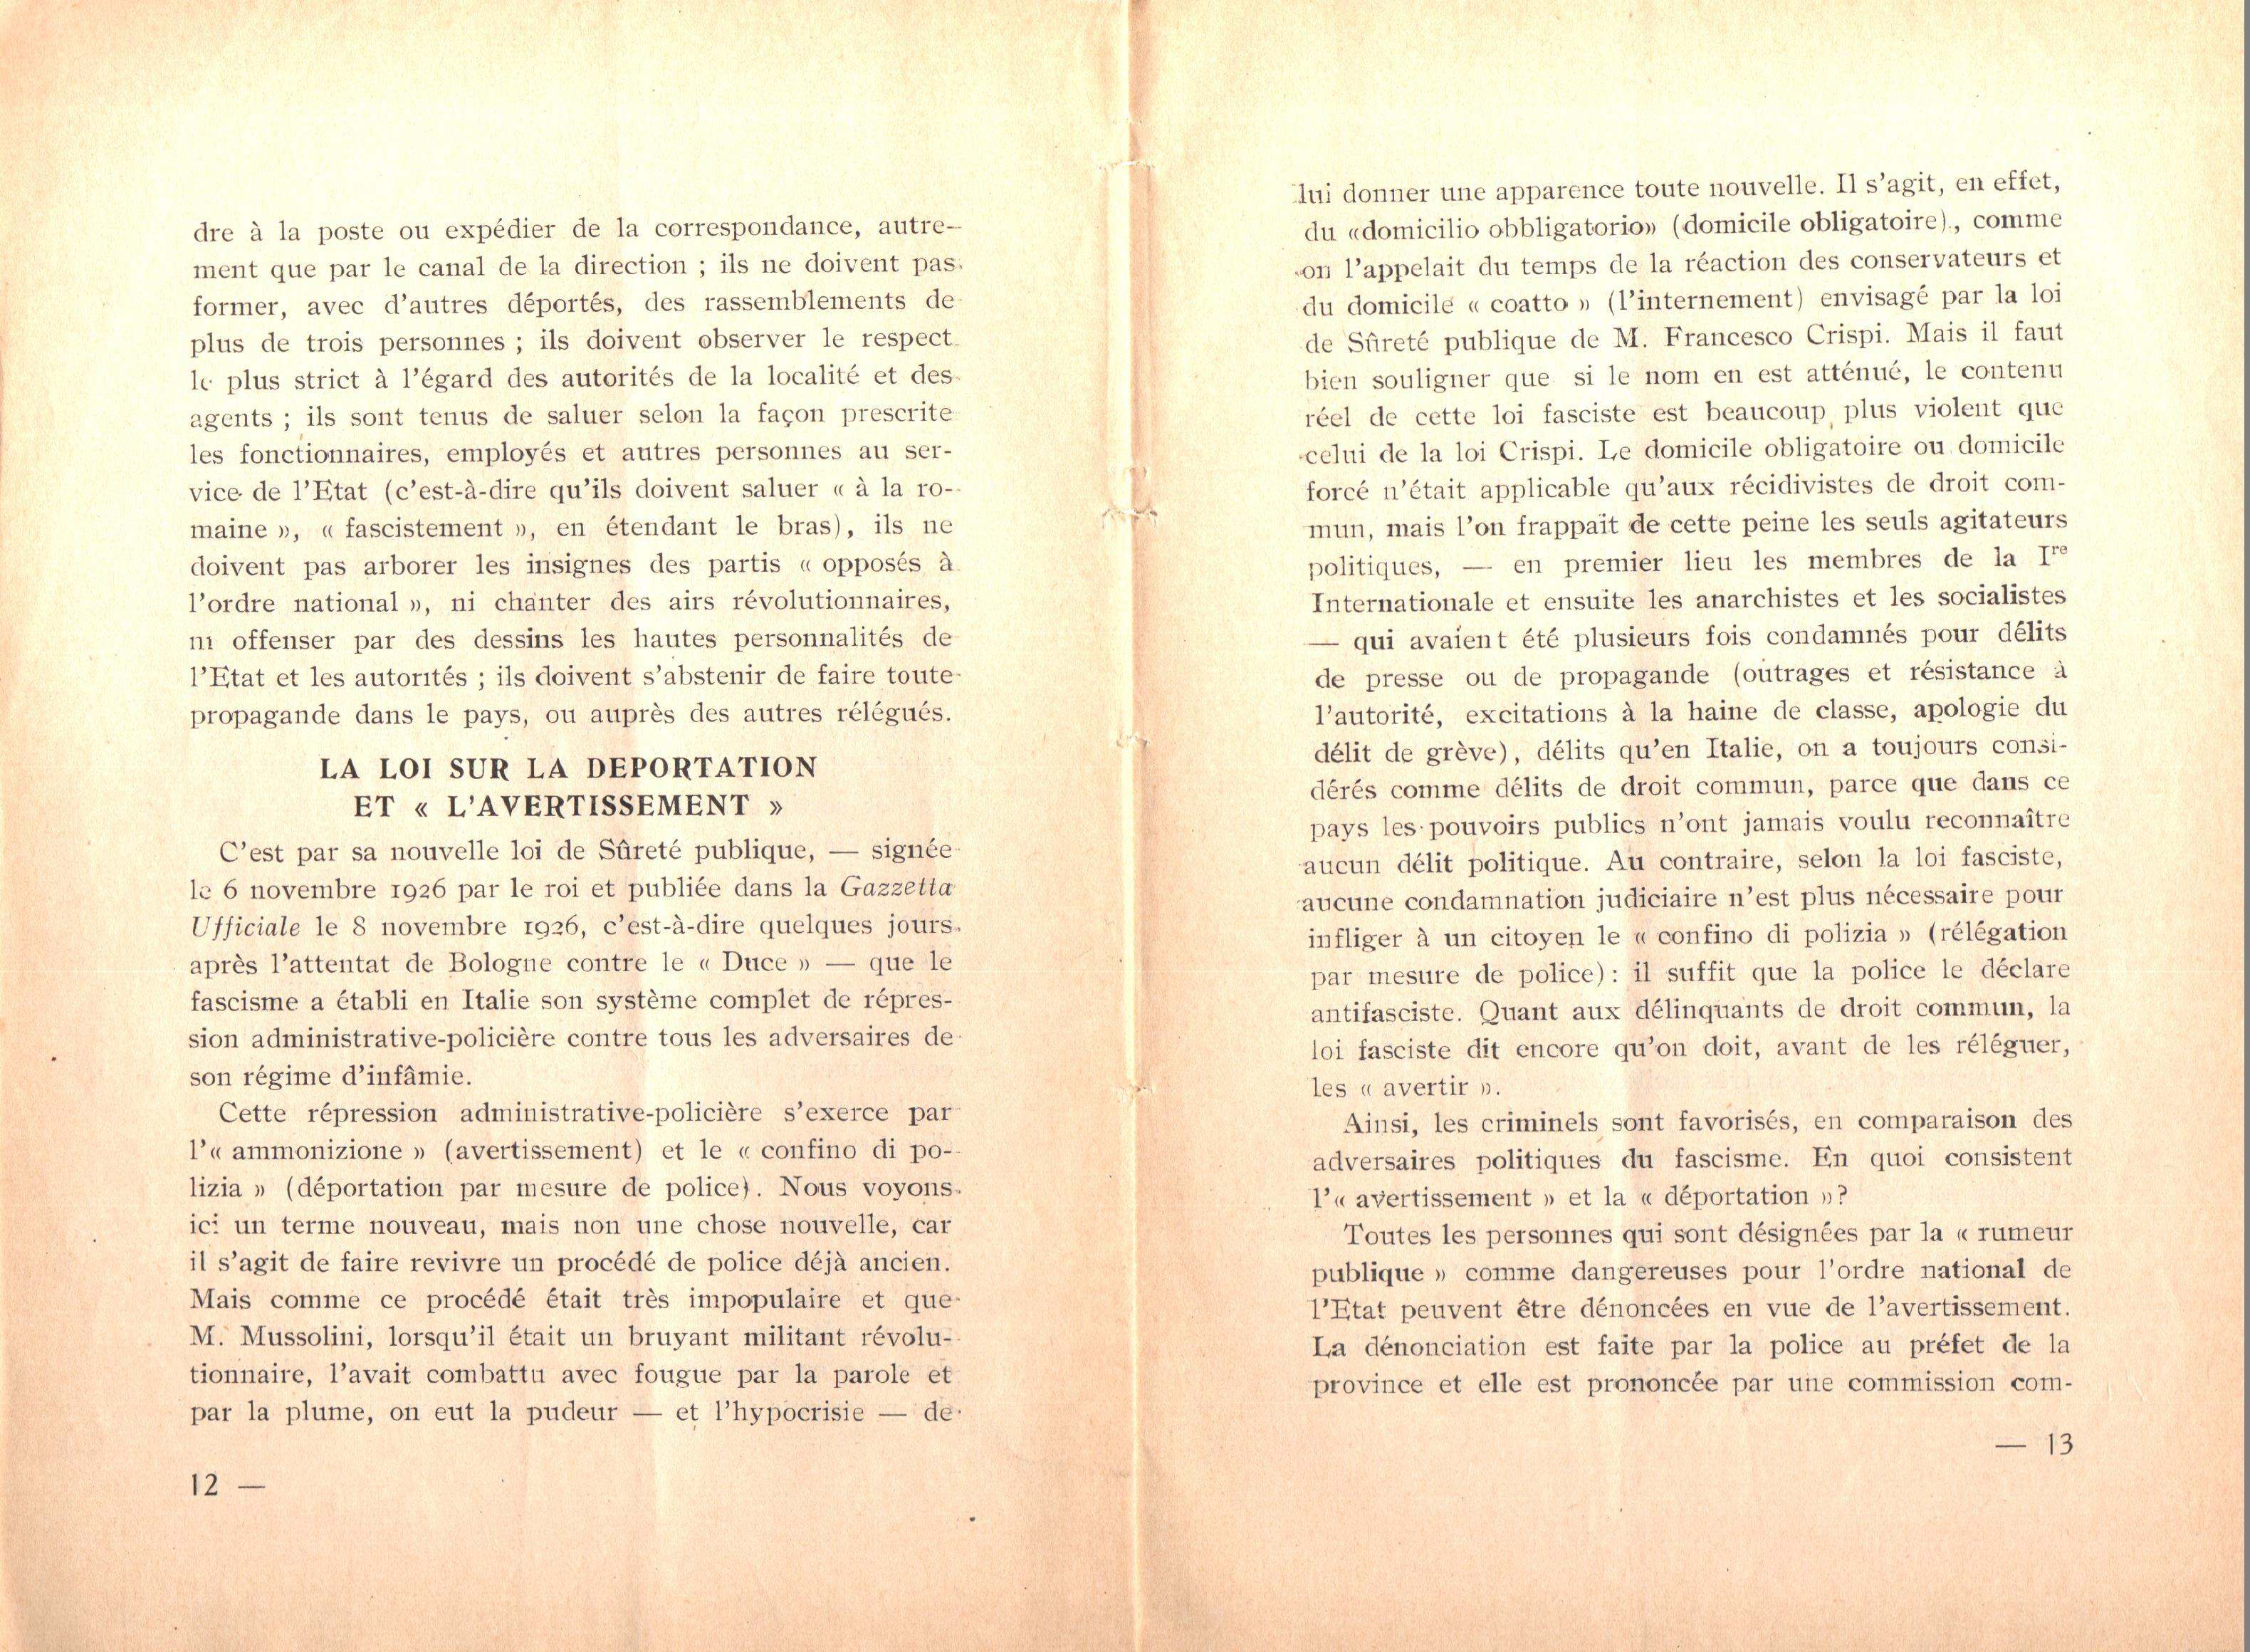 Nicola Cilla, Les «Cayennes» d'Italie - pag. 8